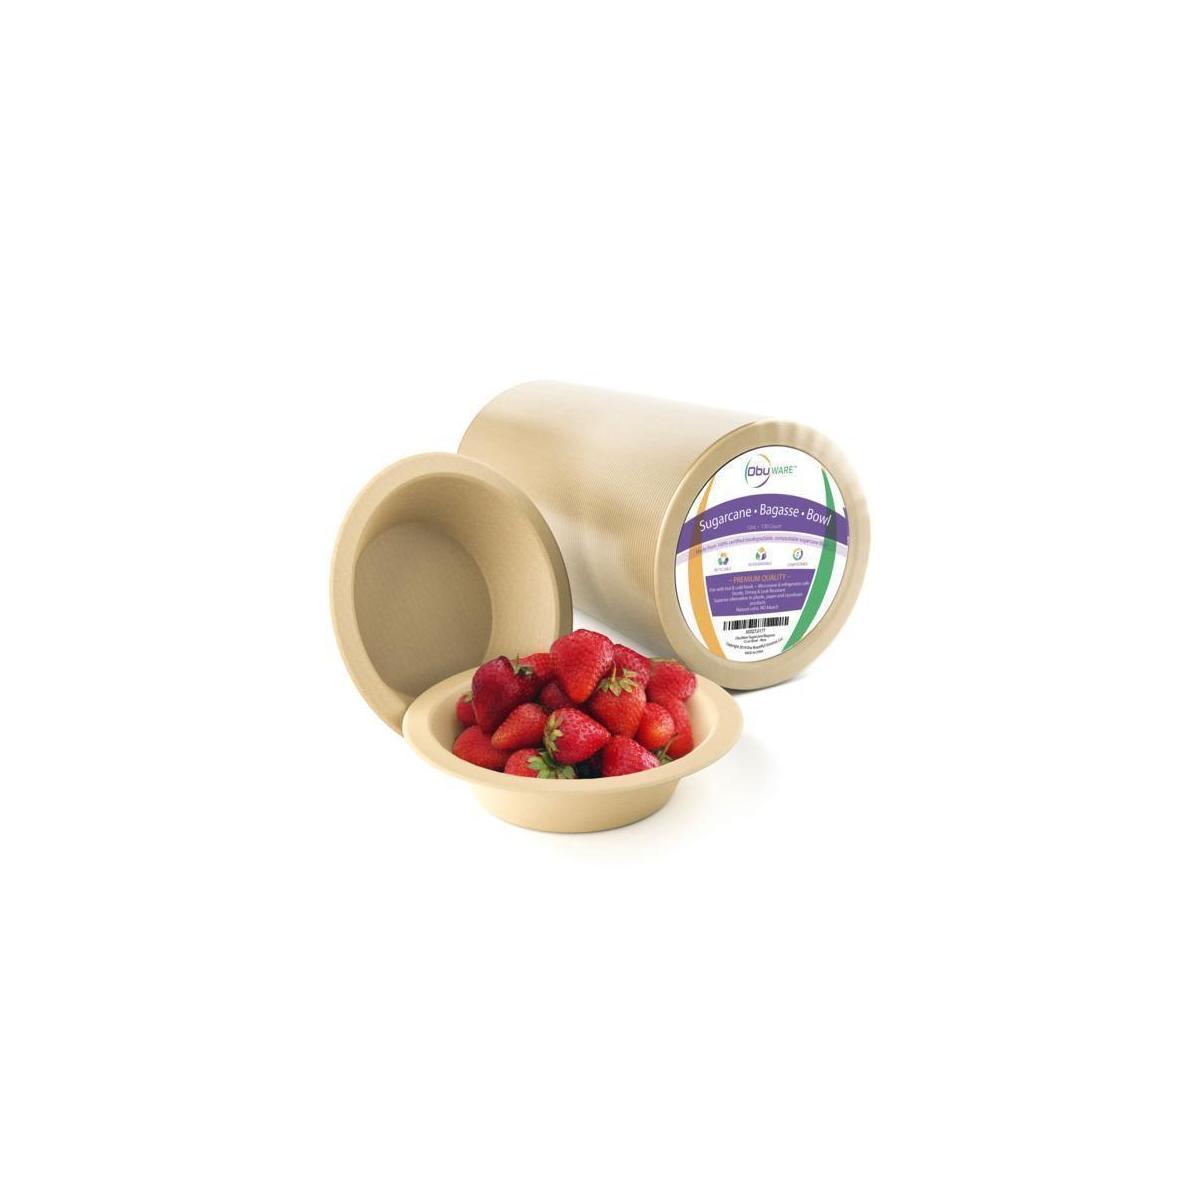 ObuWare Premium Biodegradable Compostable Bagasse Bowls (130pcs 12oz) Eco-Friendly All Natural Sugarcane Fiber | Classy High-End, No Leaks | Holds Hot, Cold & Liquid Food | Microwave & Freezer Safe